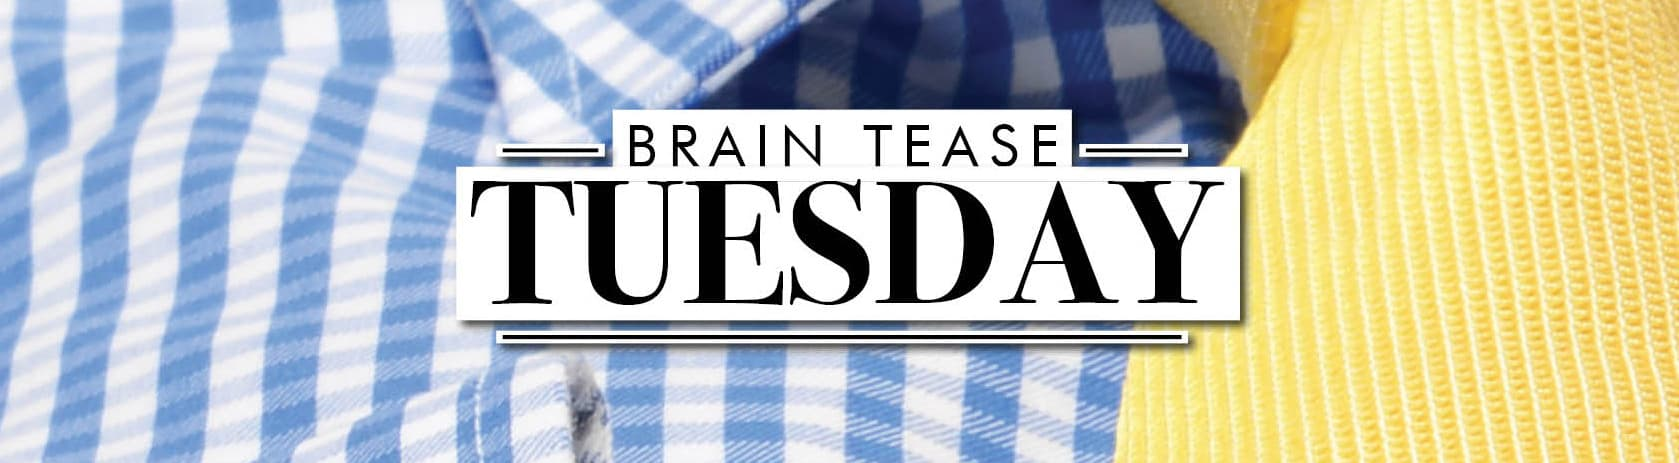 Brain Tease Tuesday Week 2